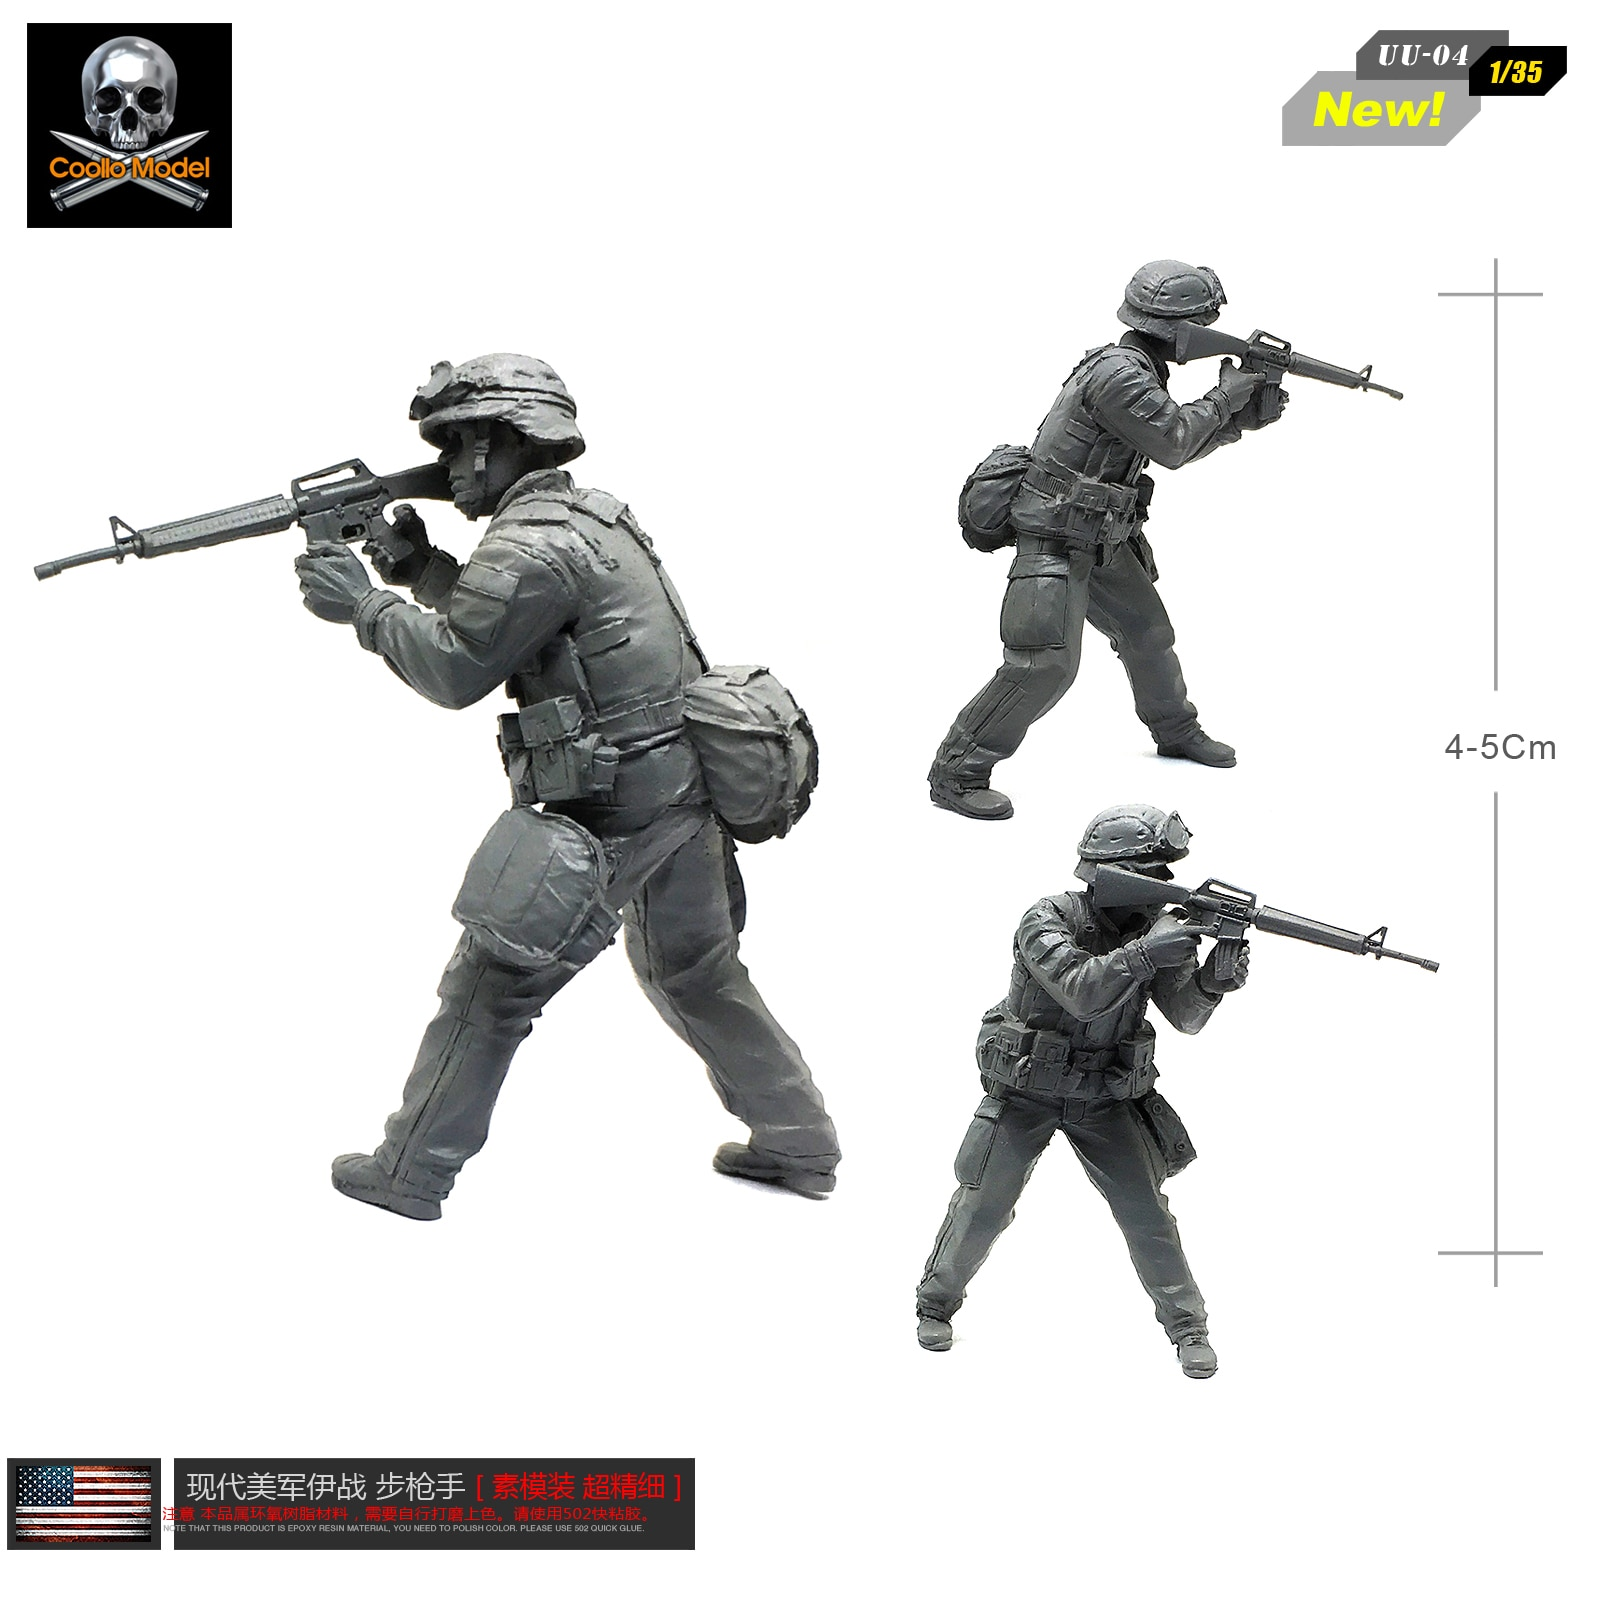 Kits de figuras de 1/35, modelo de soldado de resina americano moderno, UU-04 autoensamblado de Rifleman de Iraq